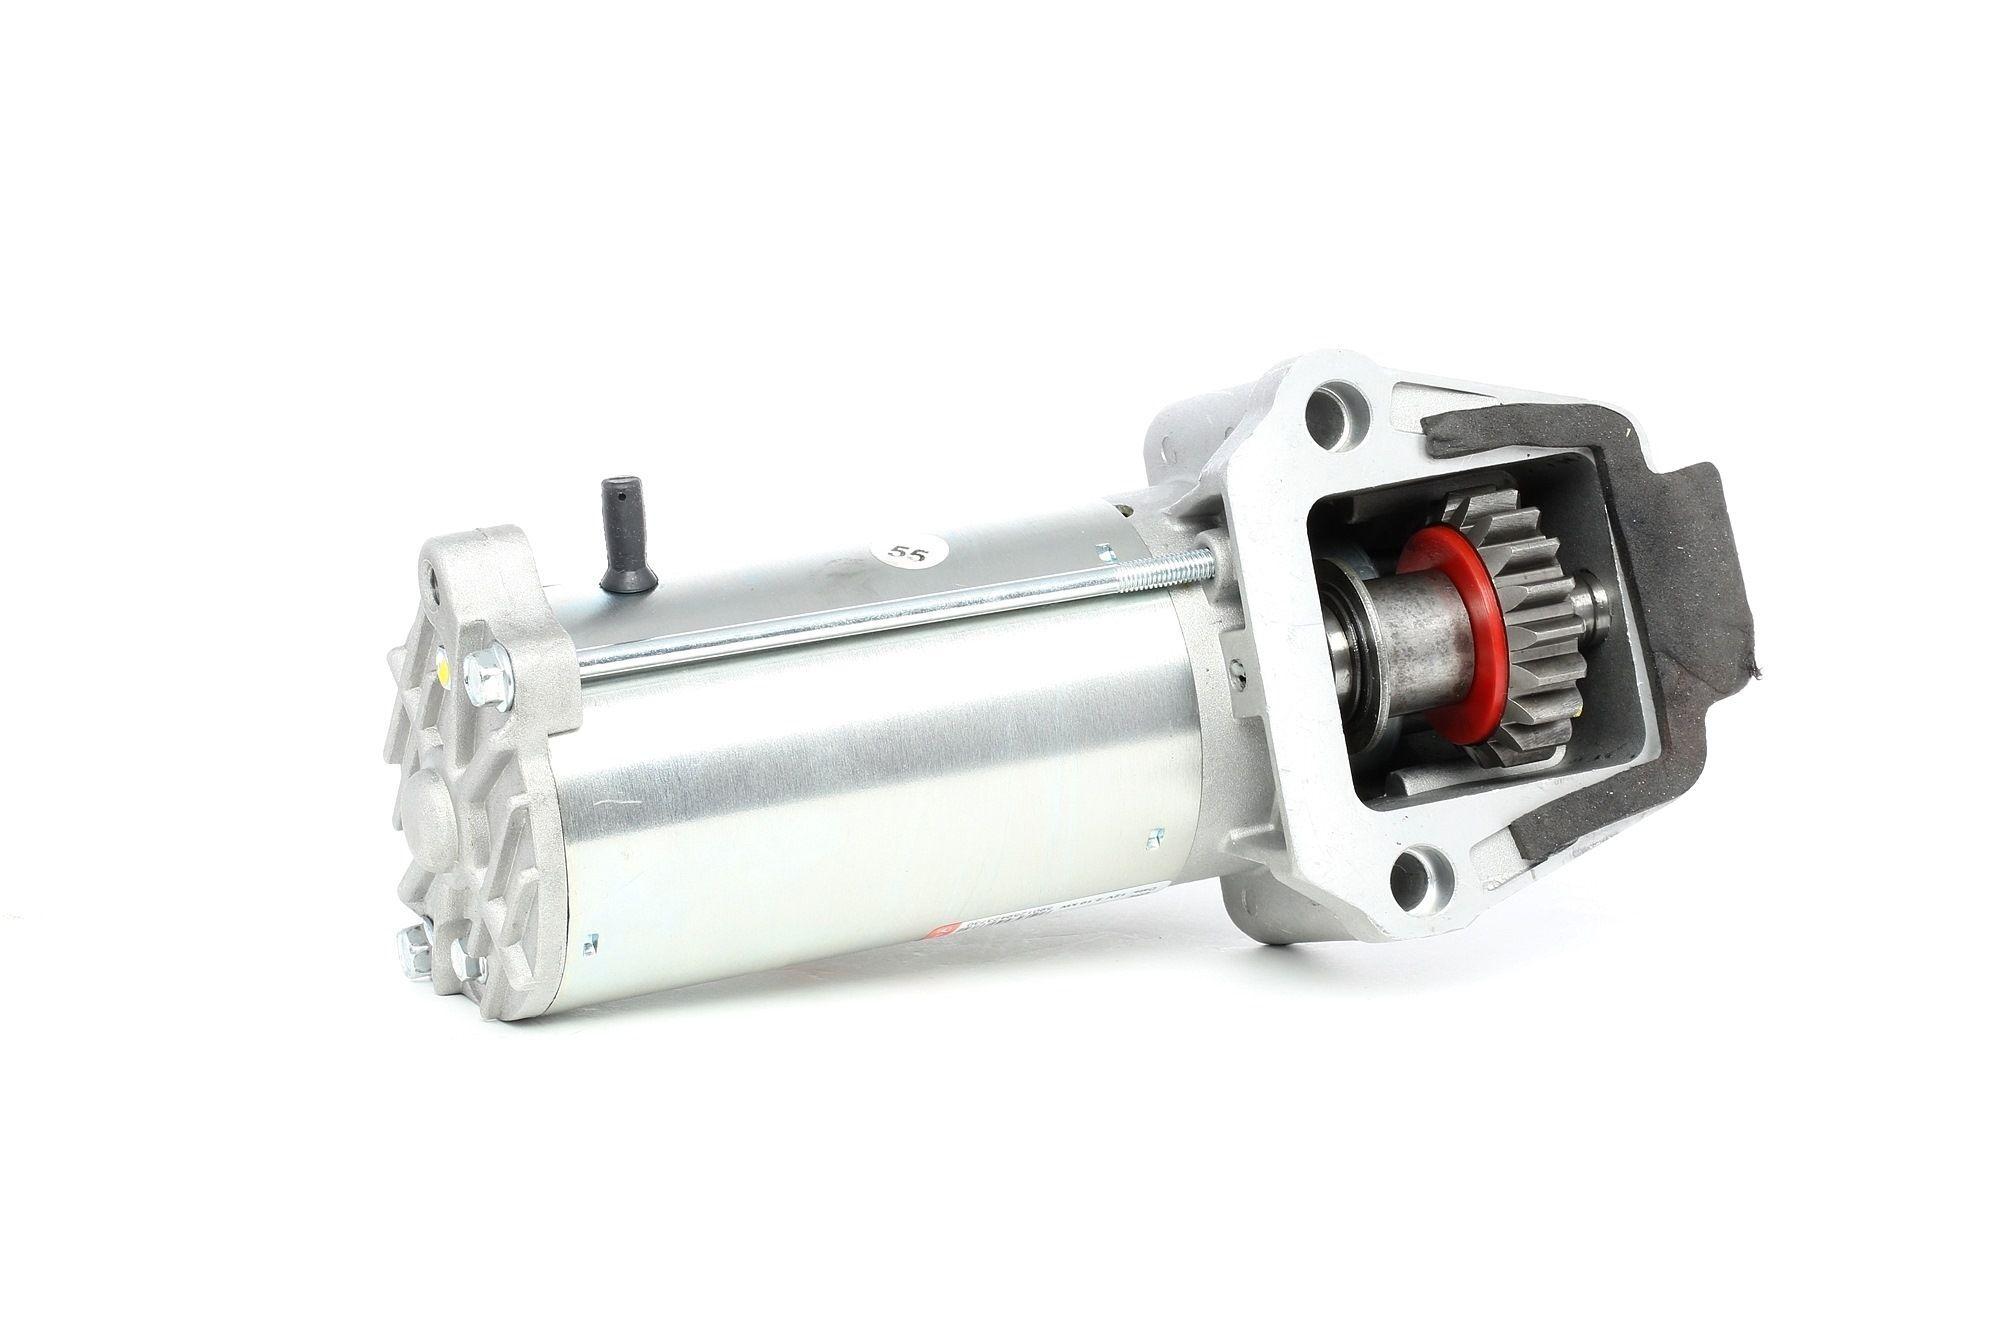 AS-PL Starttimoottori Brand new AS-PL Starter motor drive S9002 Startti,Käynnistinmoottori FORD,JAGUAR,LTI,MONDEO III Kombi BWY,MONDEO III B5Y